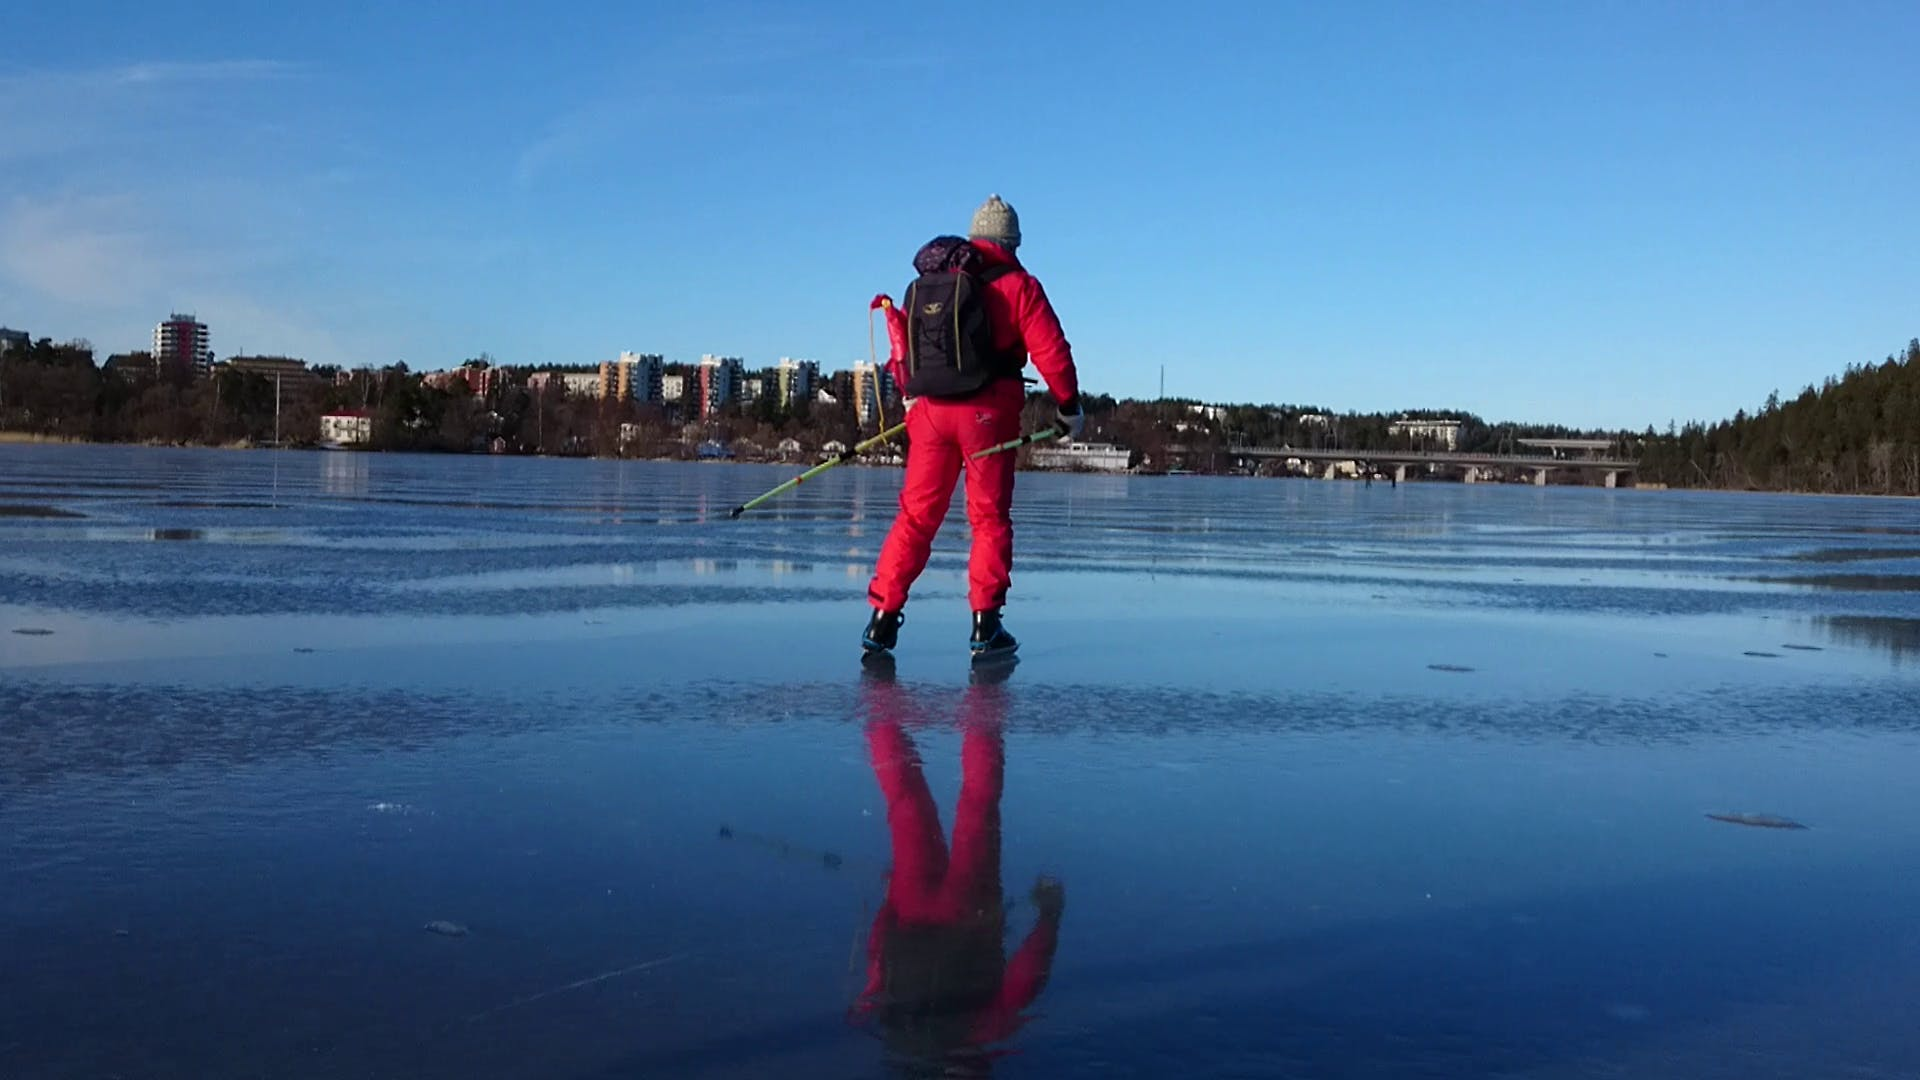 Free stock photo of winter, ice, long-haul skates